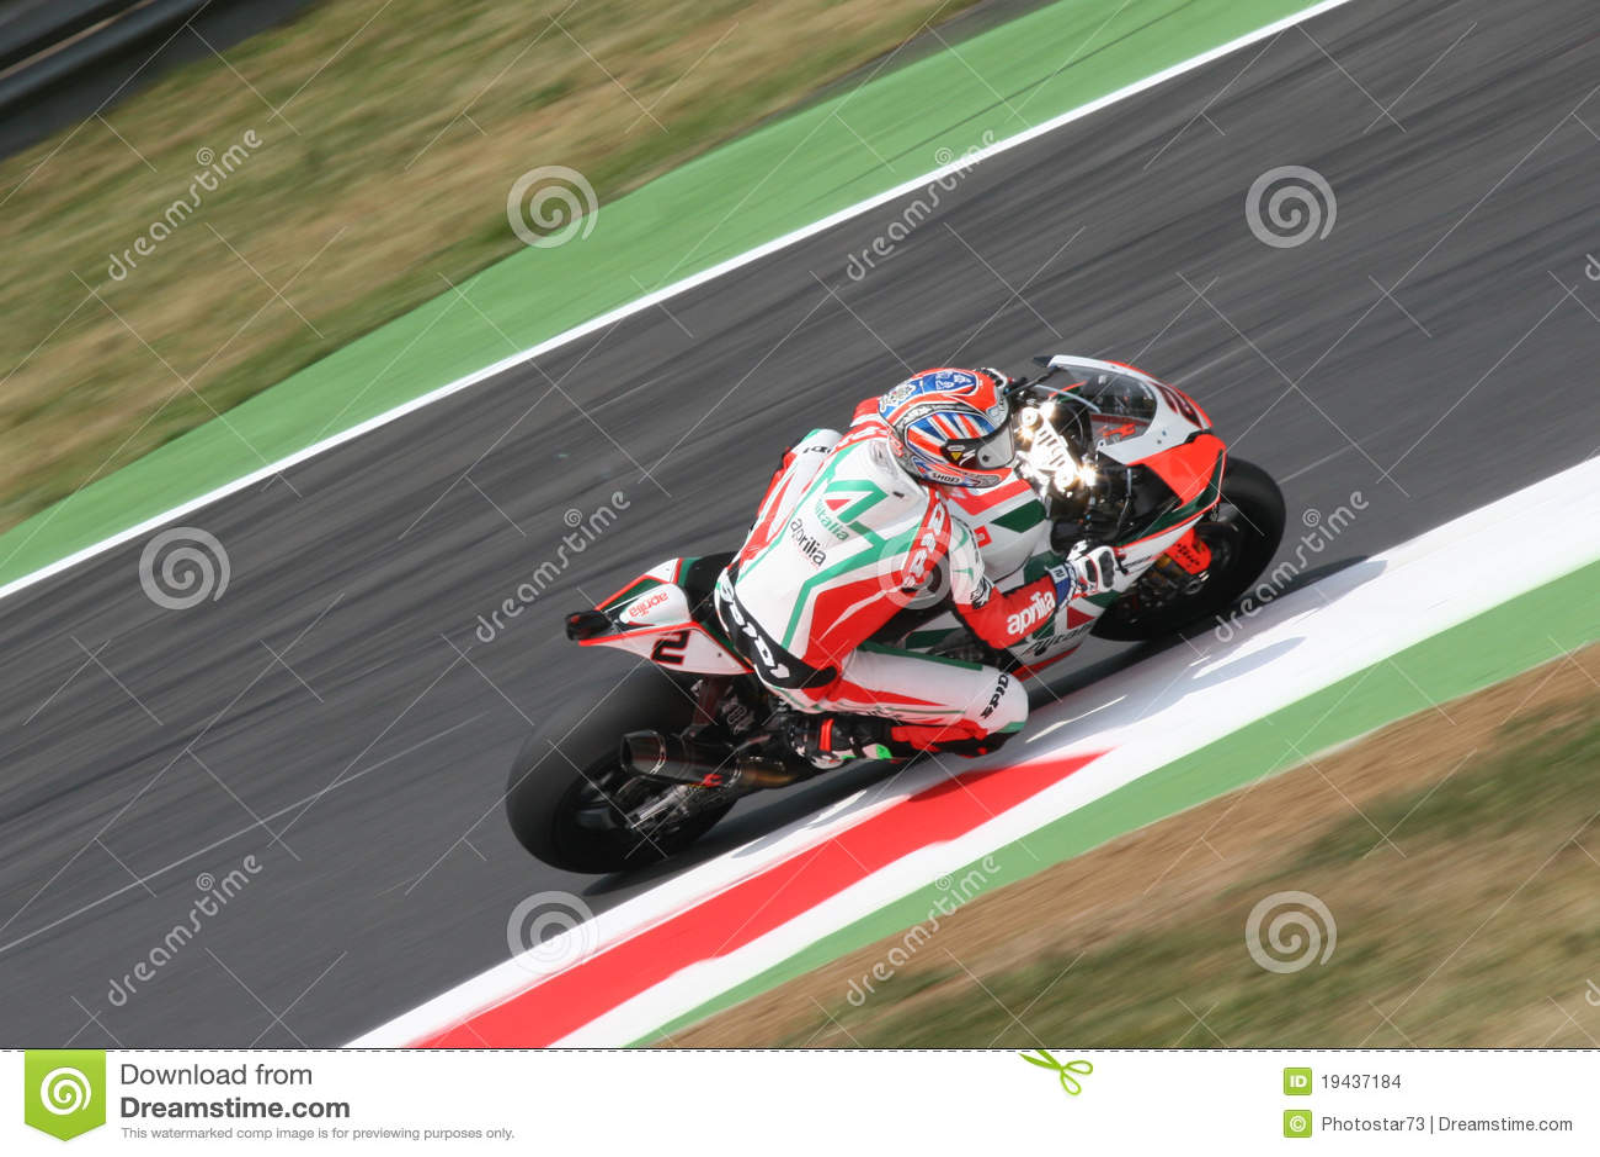 Leon camier superbike